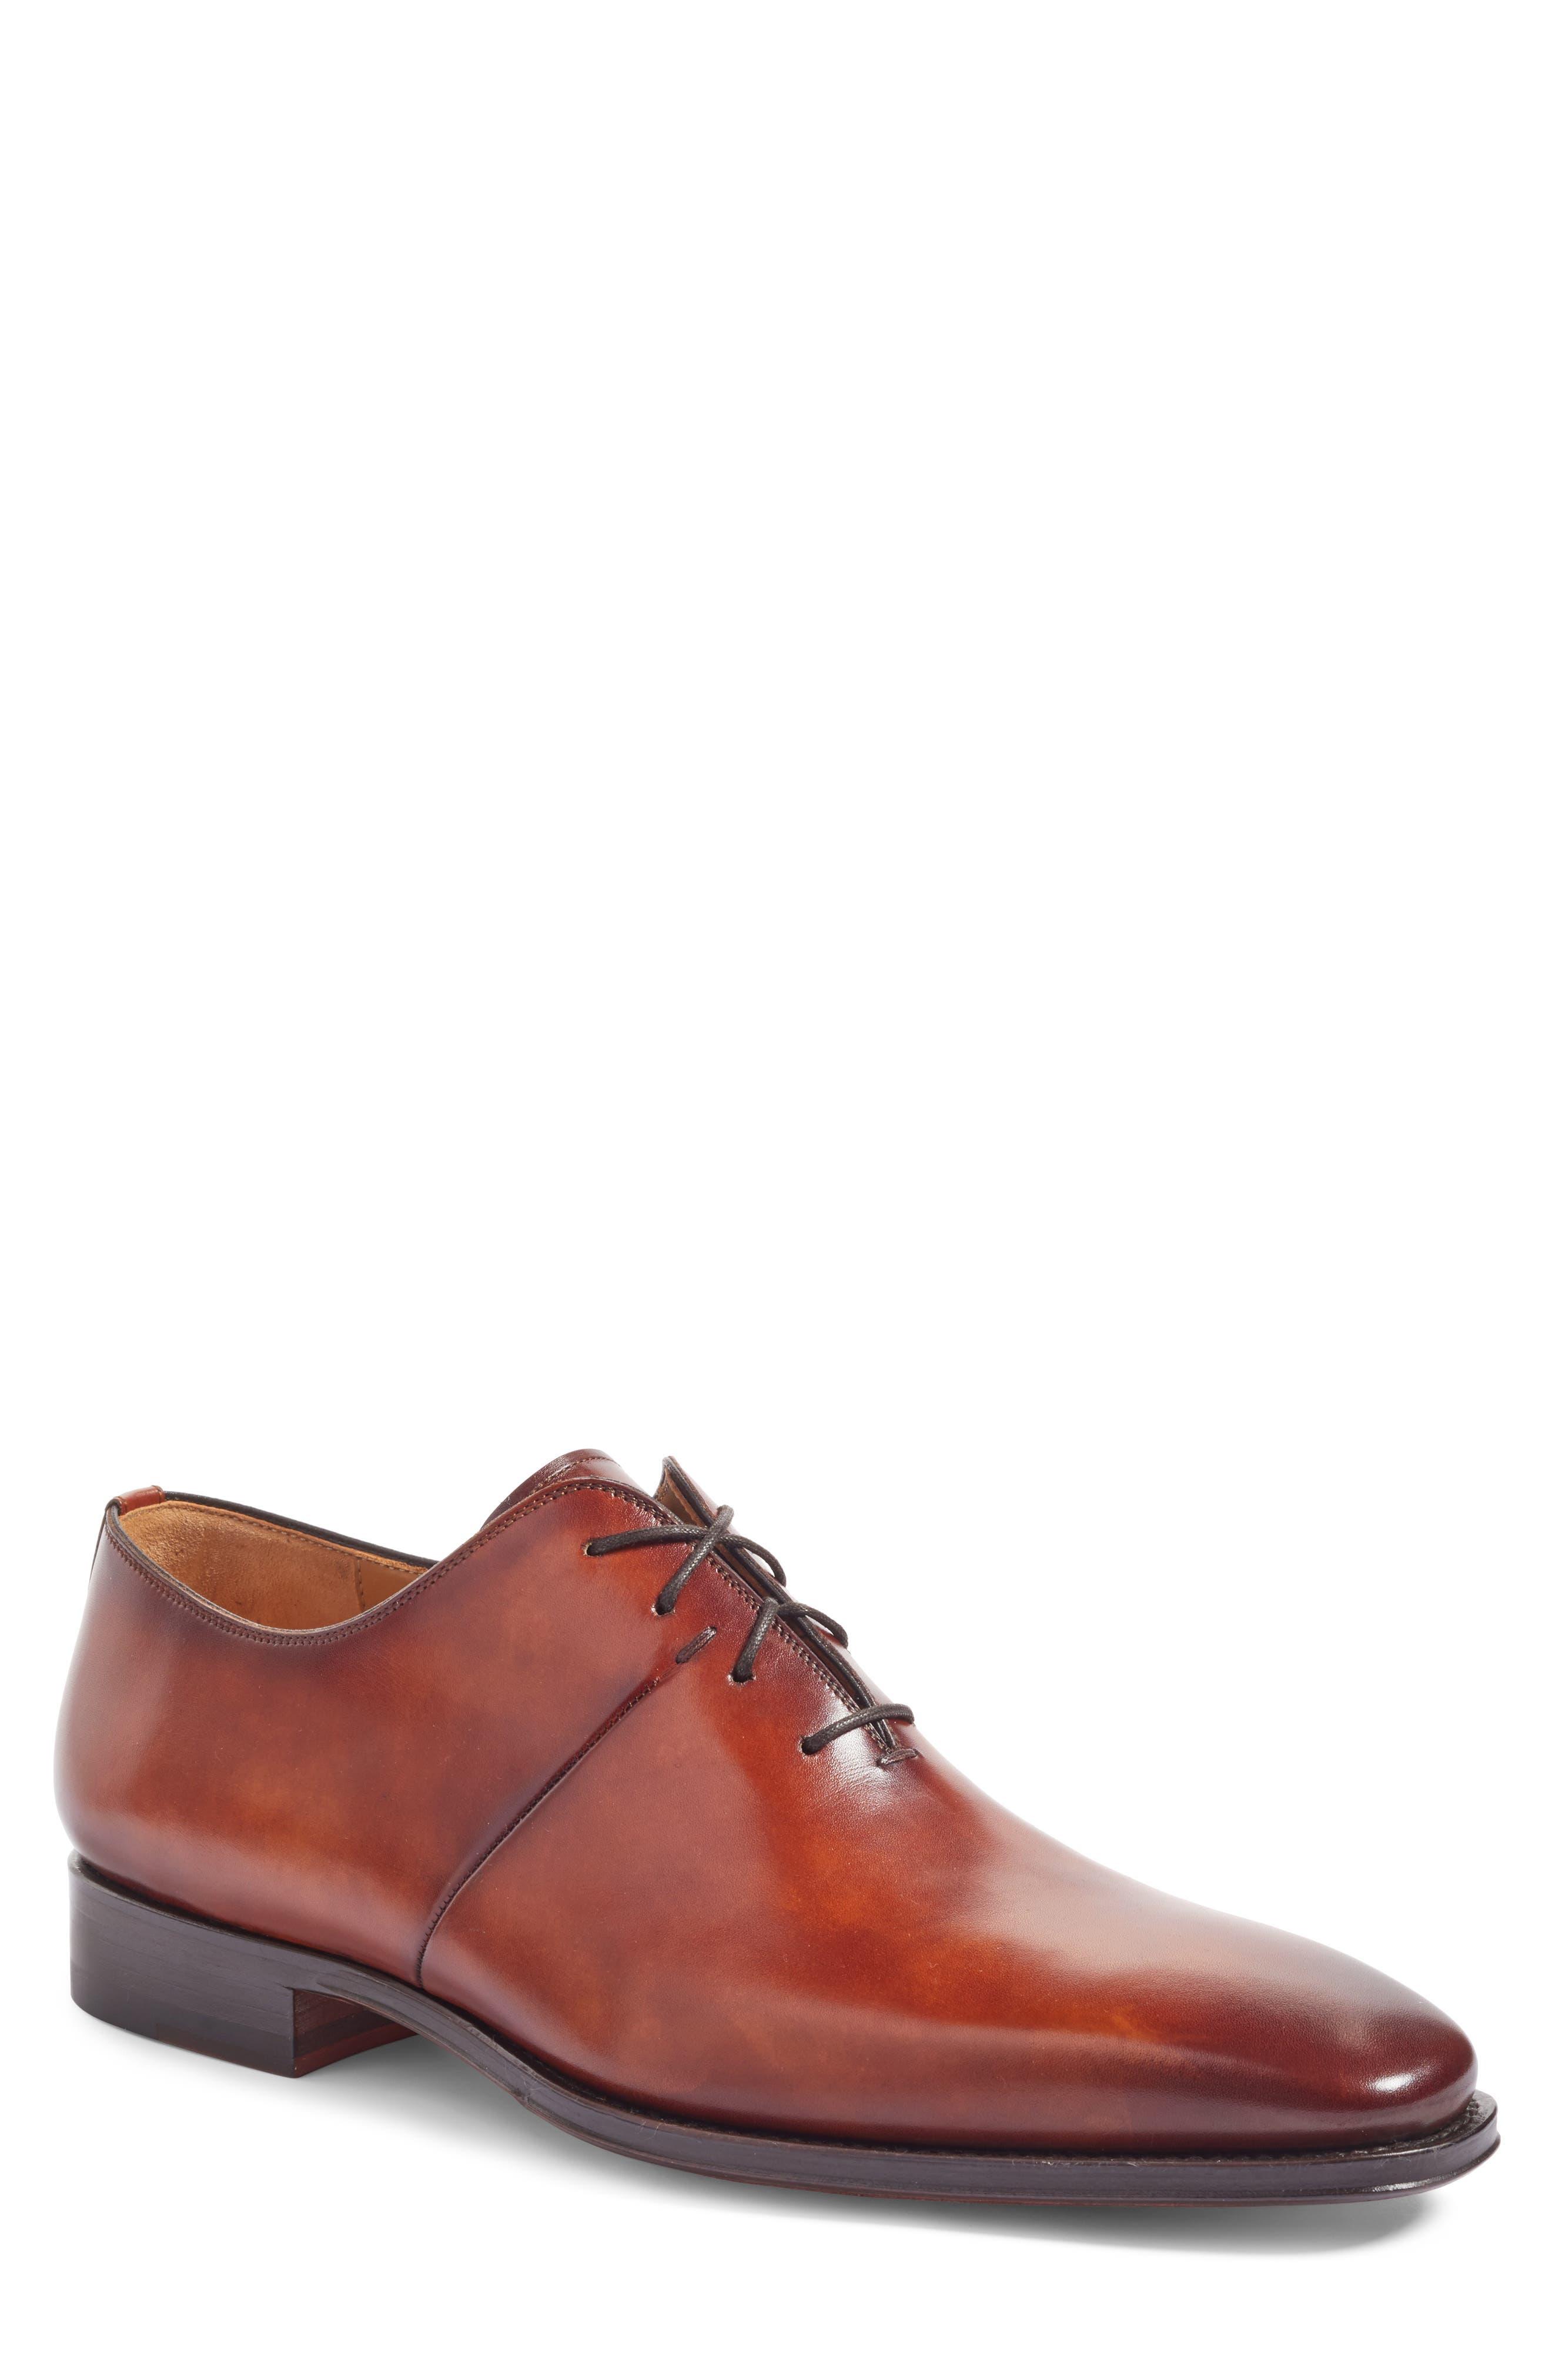 Cornado Plain Toe Oxford,                         Main,                         color, 200